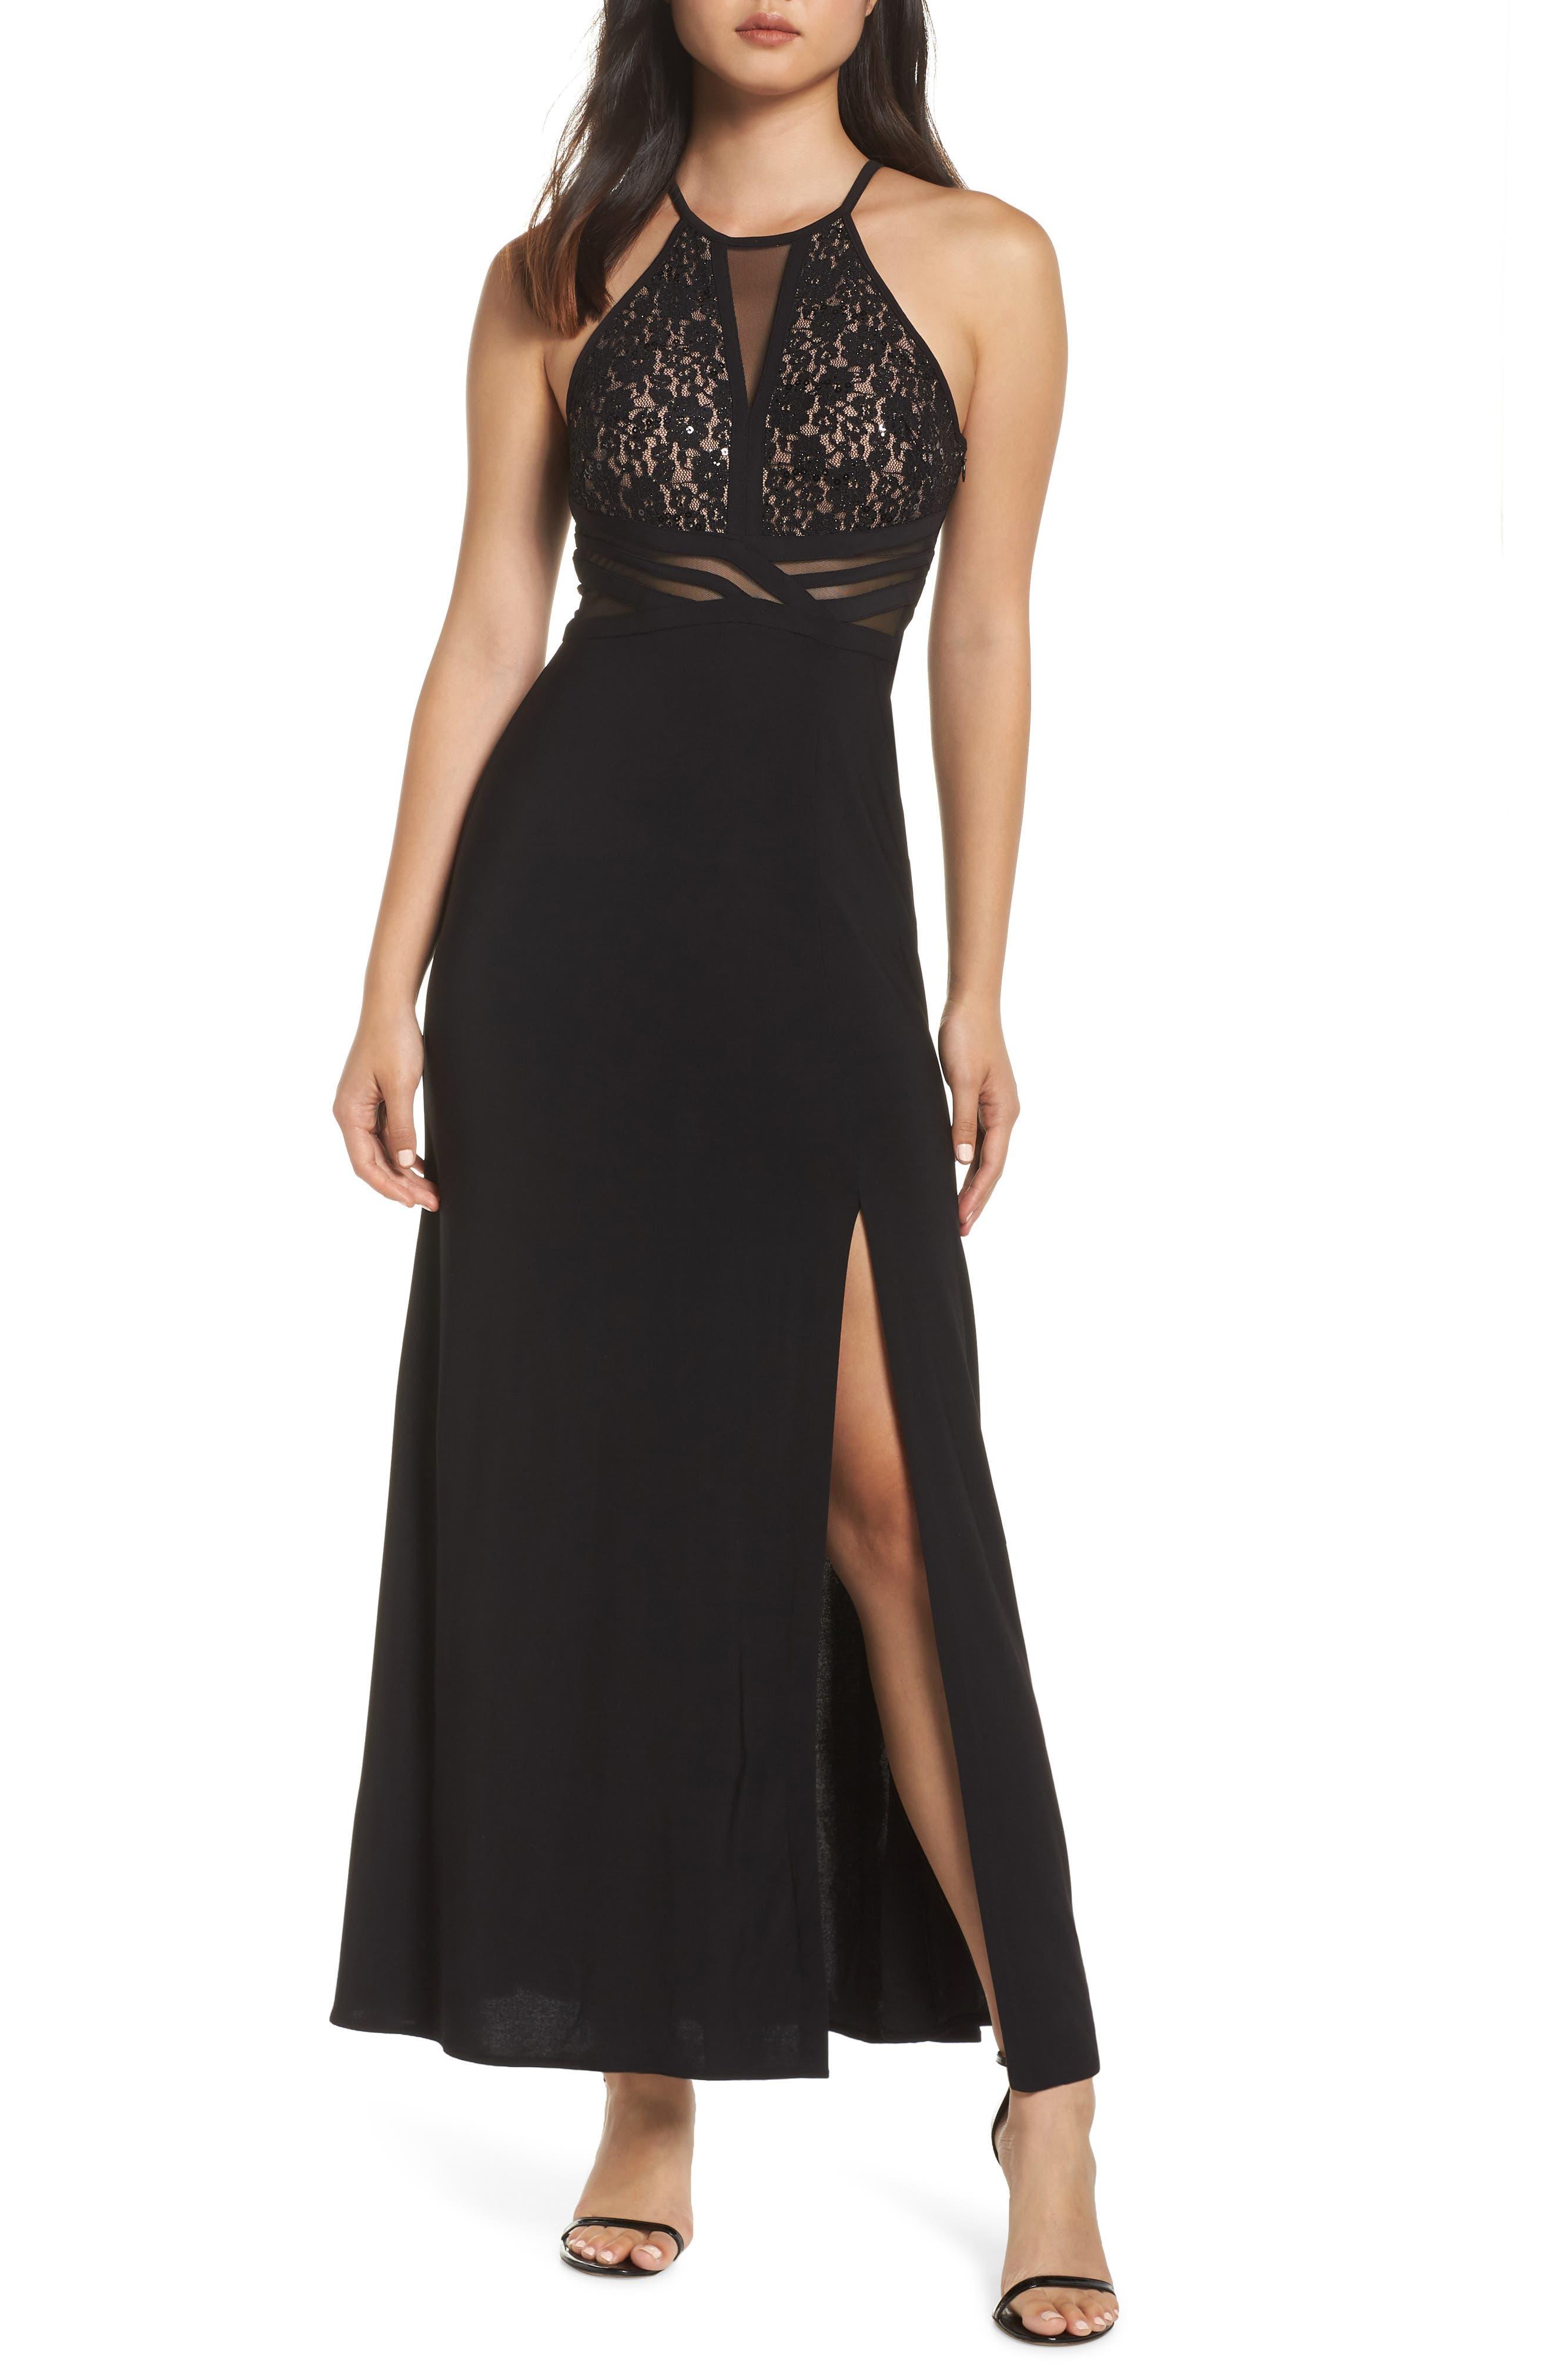 MORGAN & CO.,                             Lace & Illusion Mesh Bodice Gown,                             Main thumbnail 1, color,                             BLACK/ NUDE